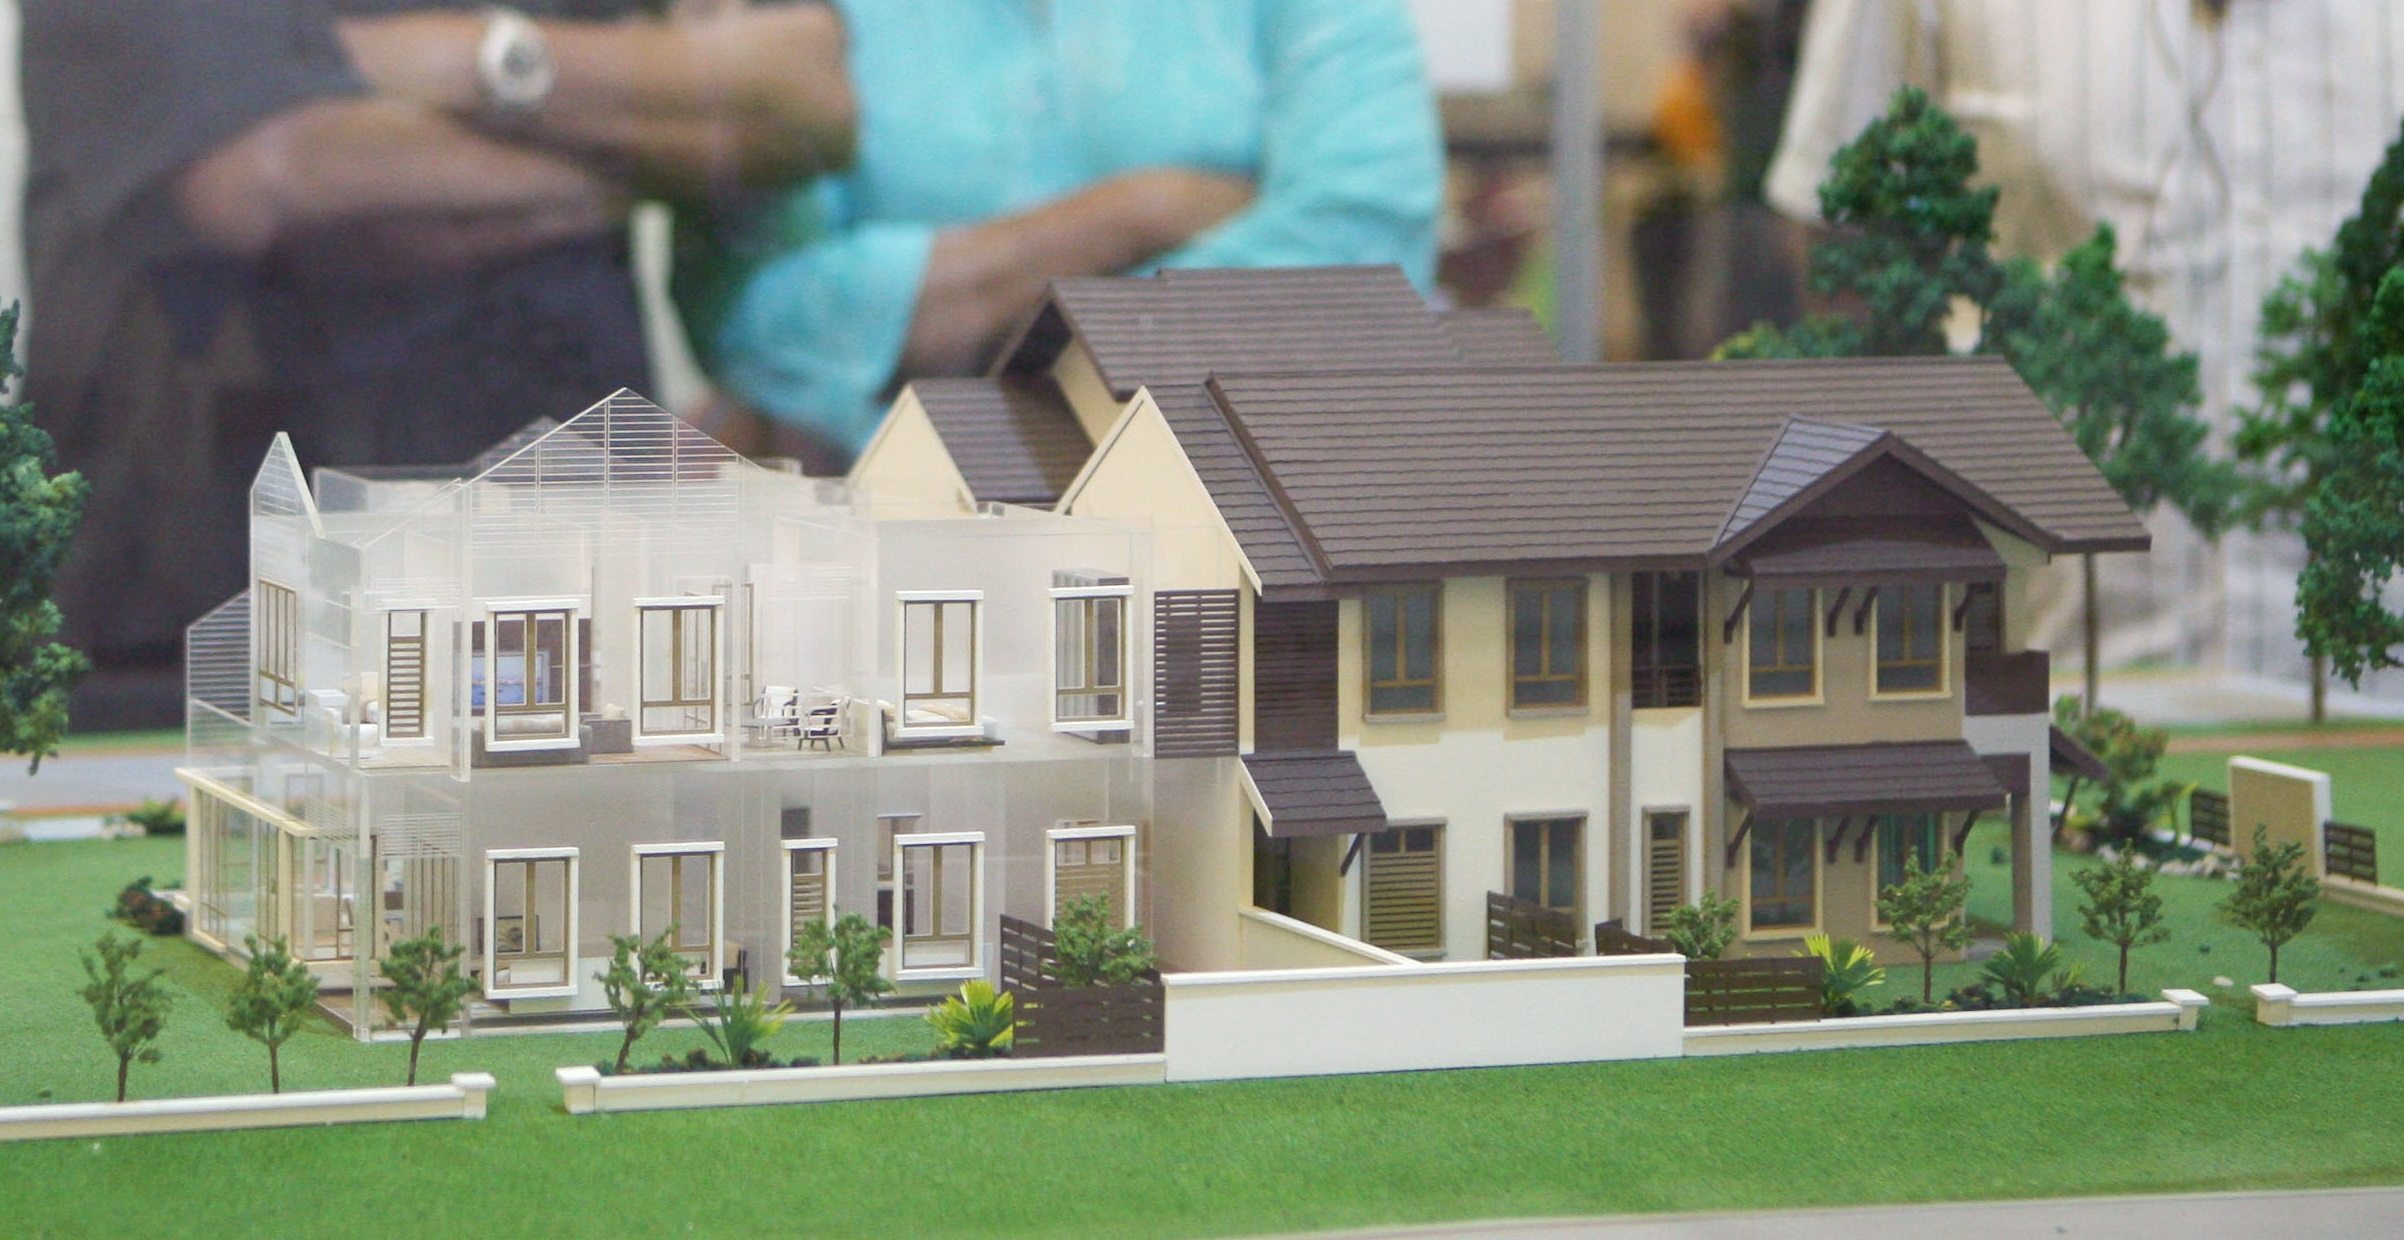 House Model Malaysia